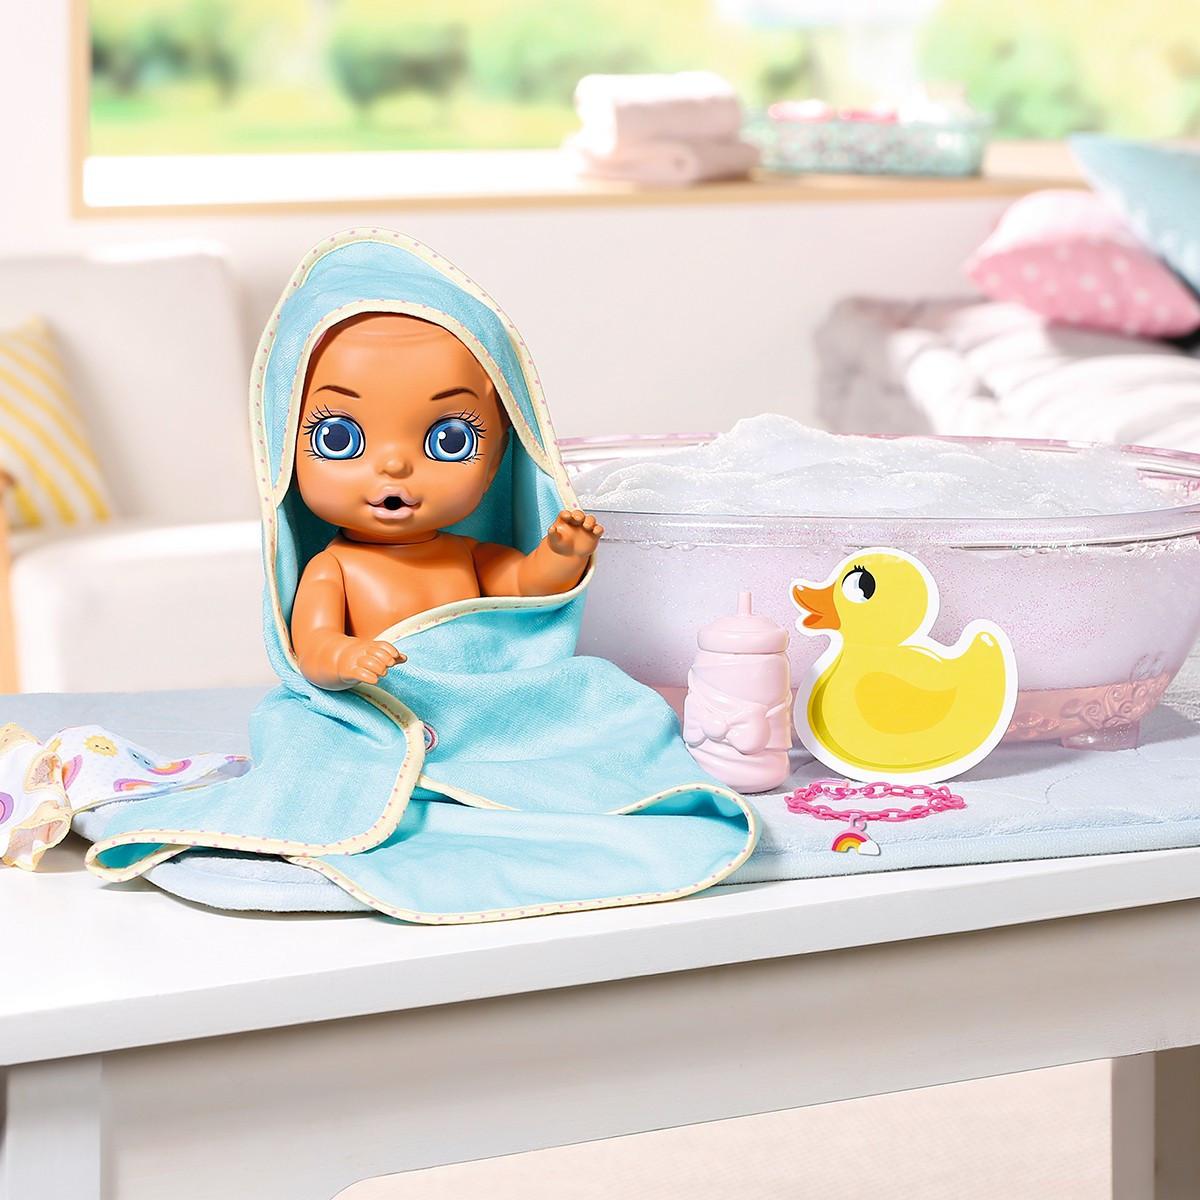 Кукла Беби Берн  Очаровательная Китти Baby Born 904114 Surprise with bath